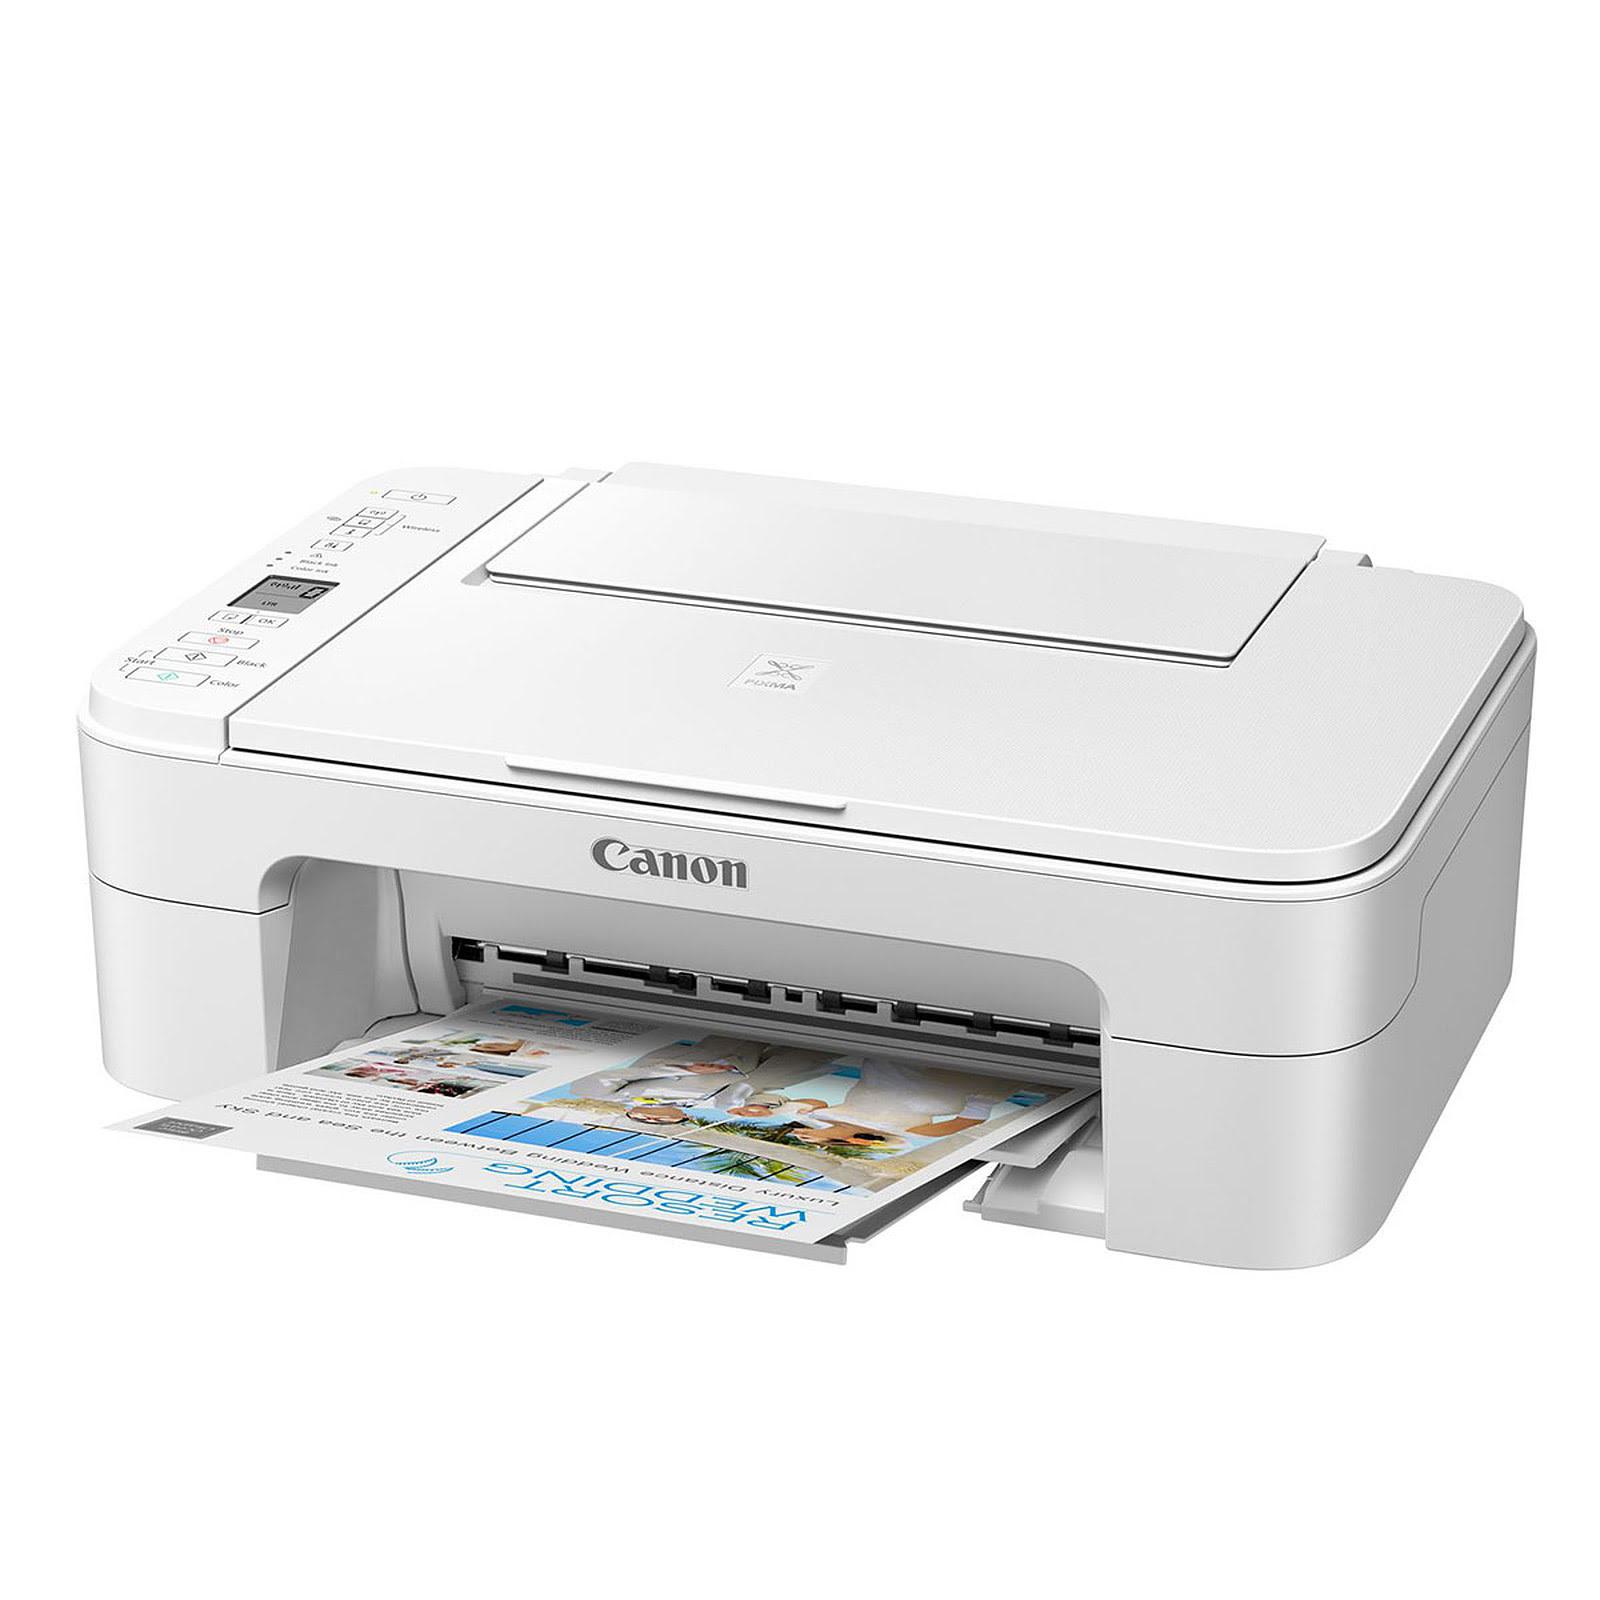 Imprimante multifonction Canon PIXMA TS3351 White - Cybertek.fr - 2